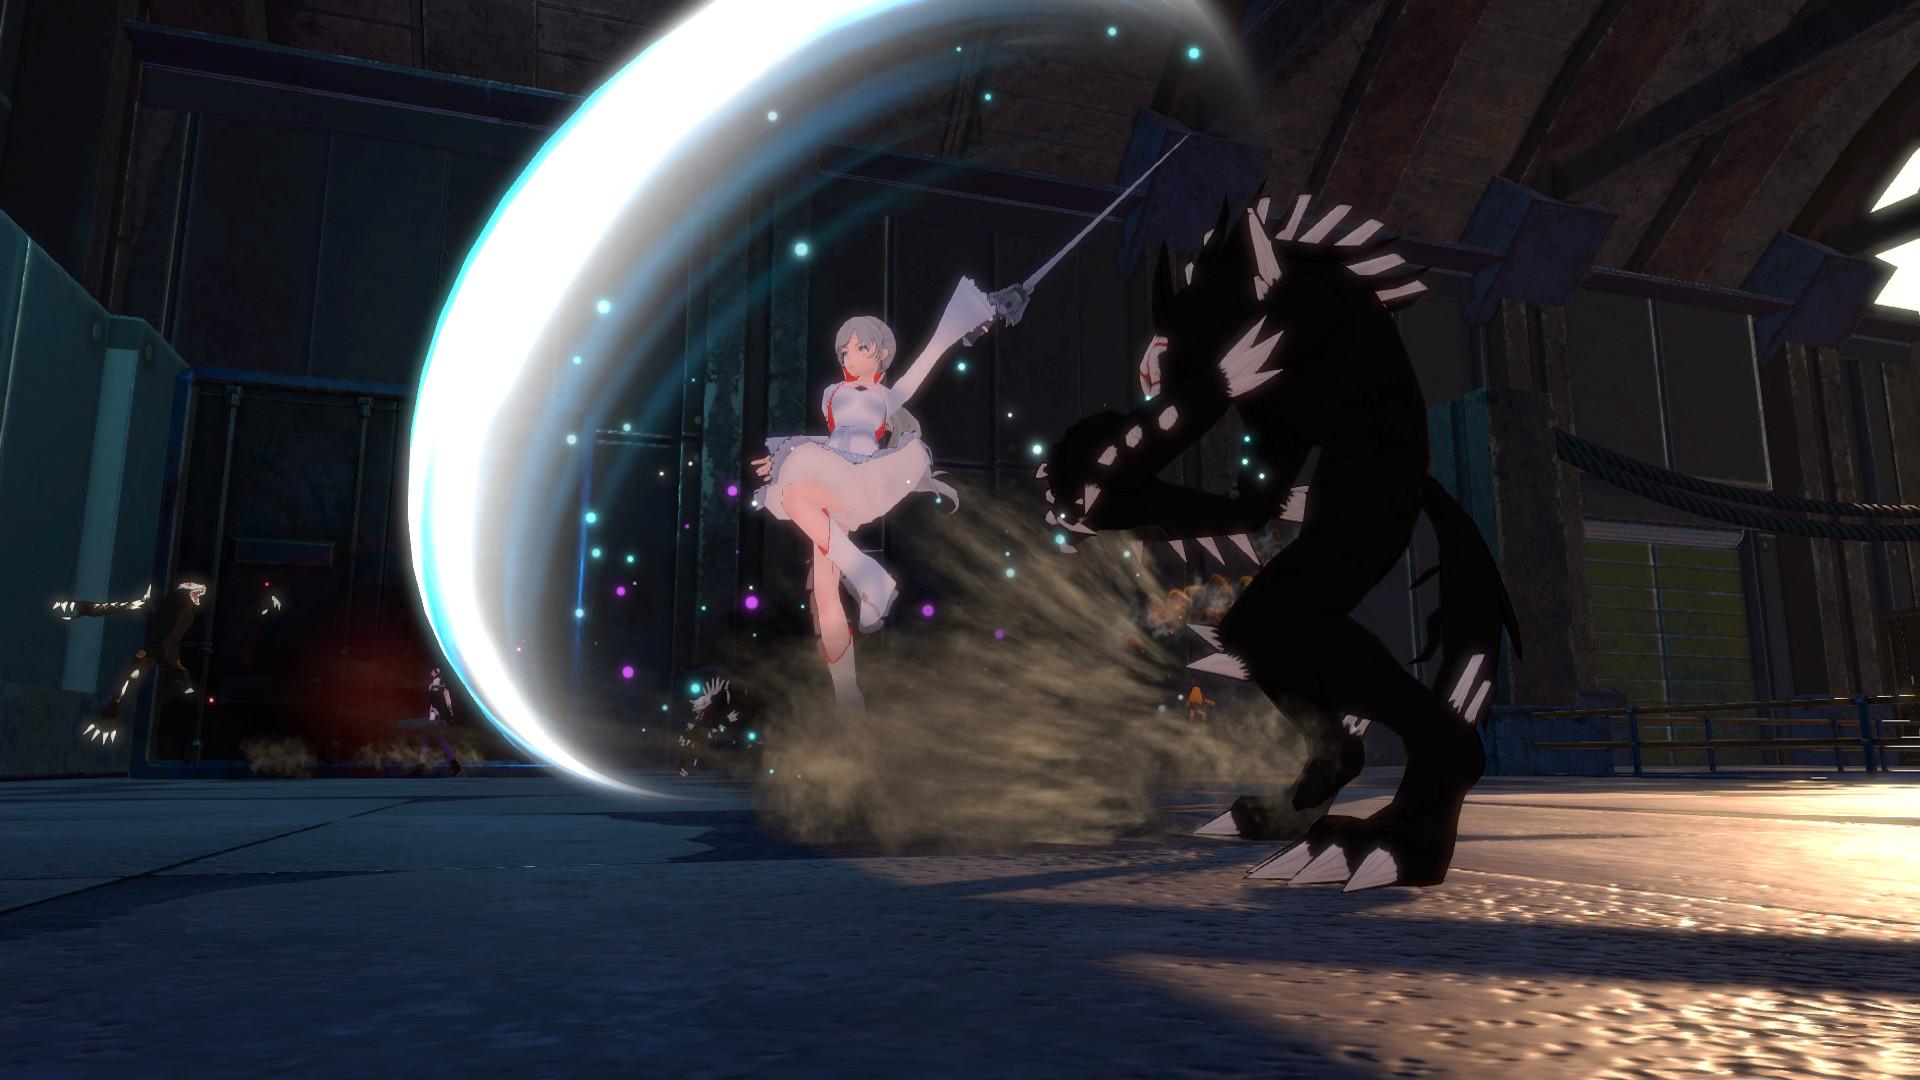 RWBY: Grimm Eclipse Screenshot 2